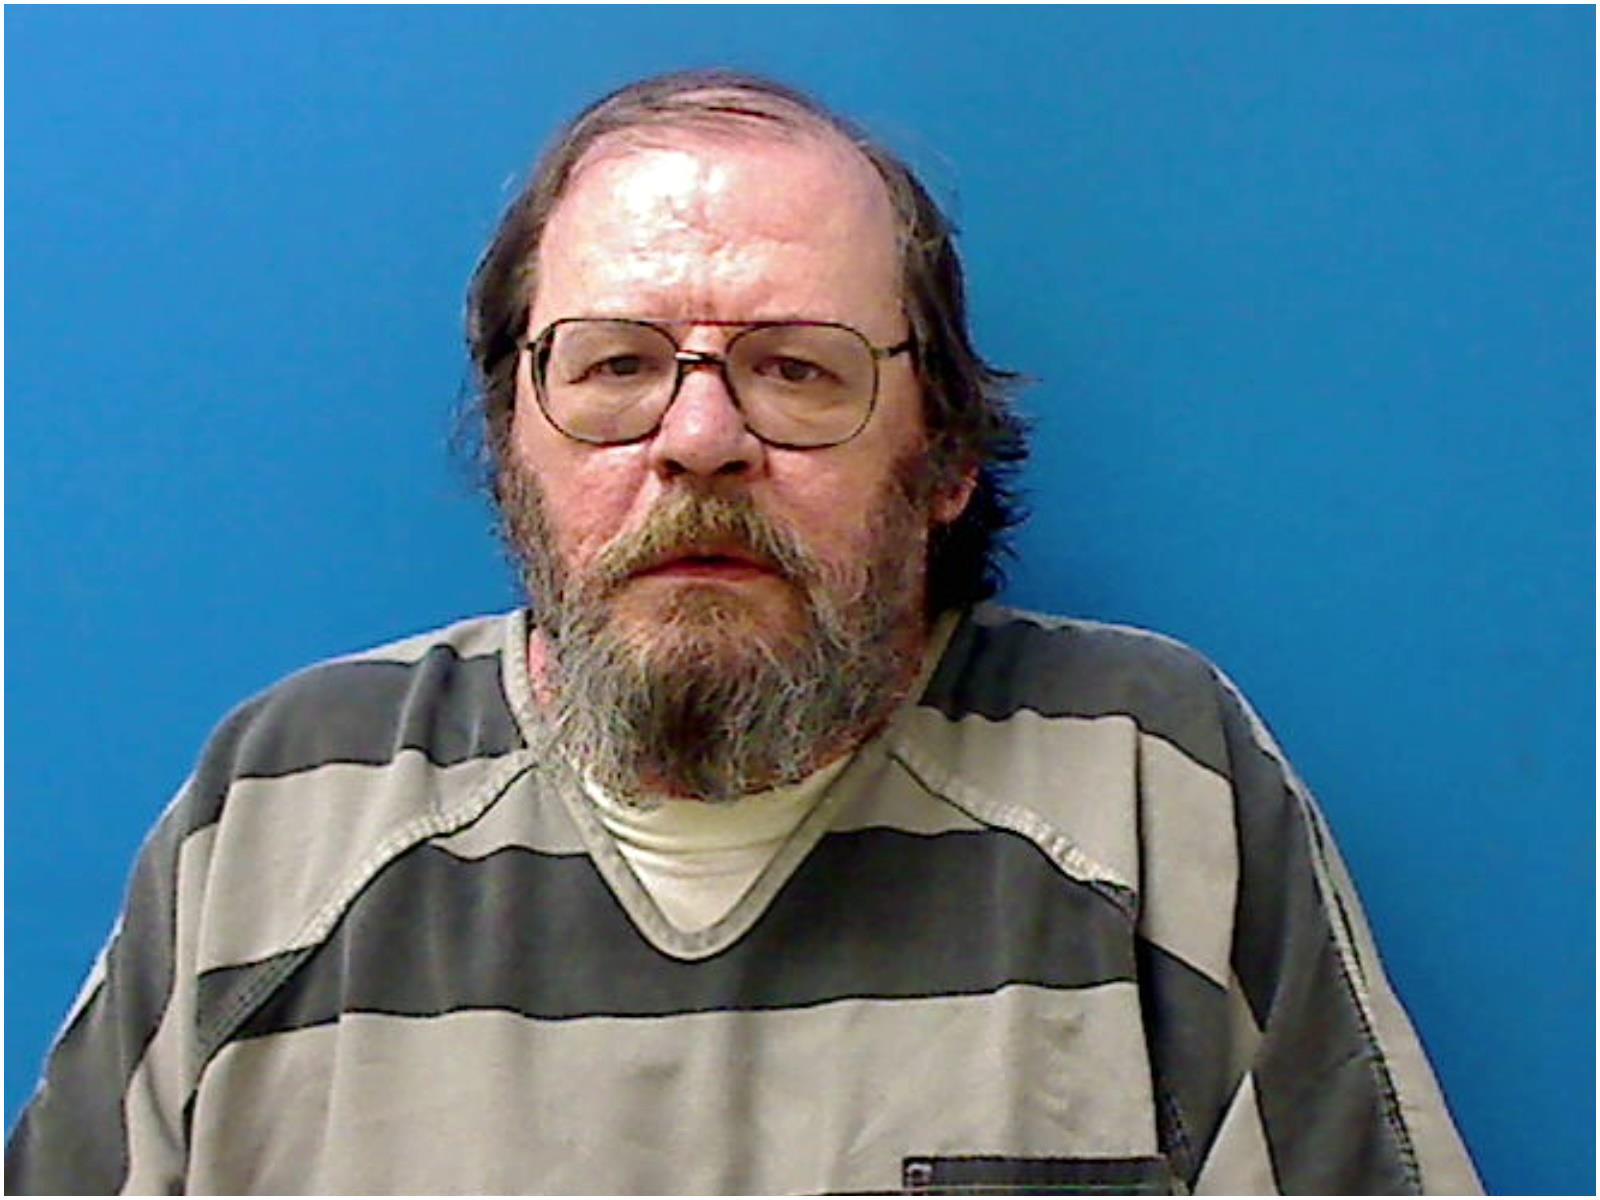 Defendant Rickey Waldrop, Sr.